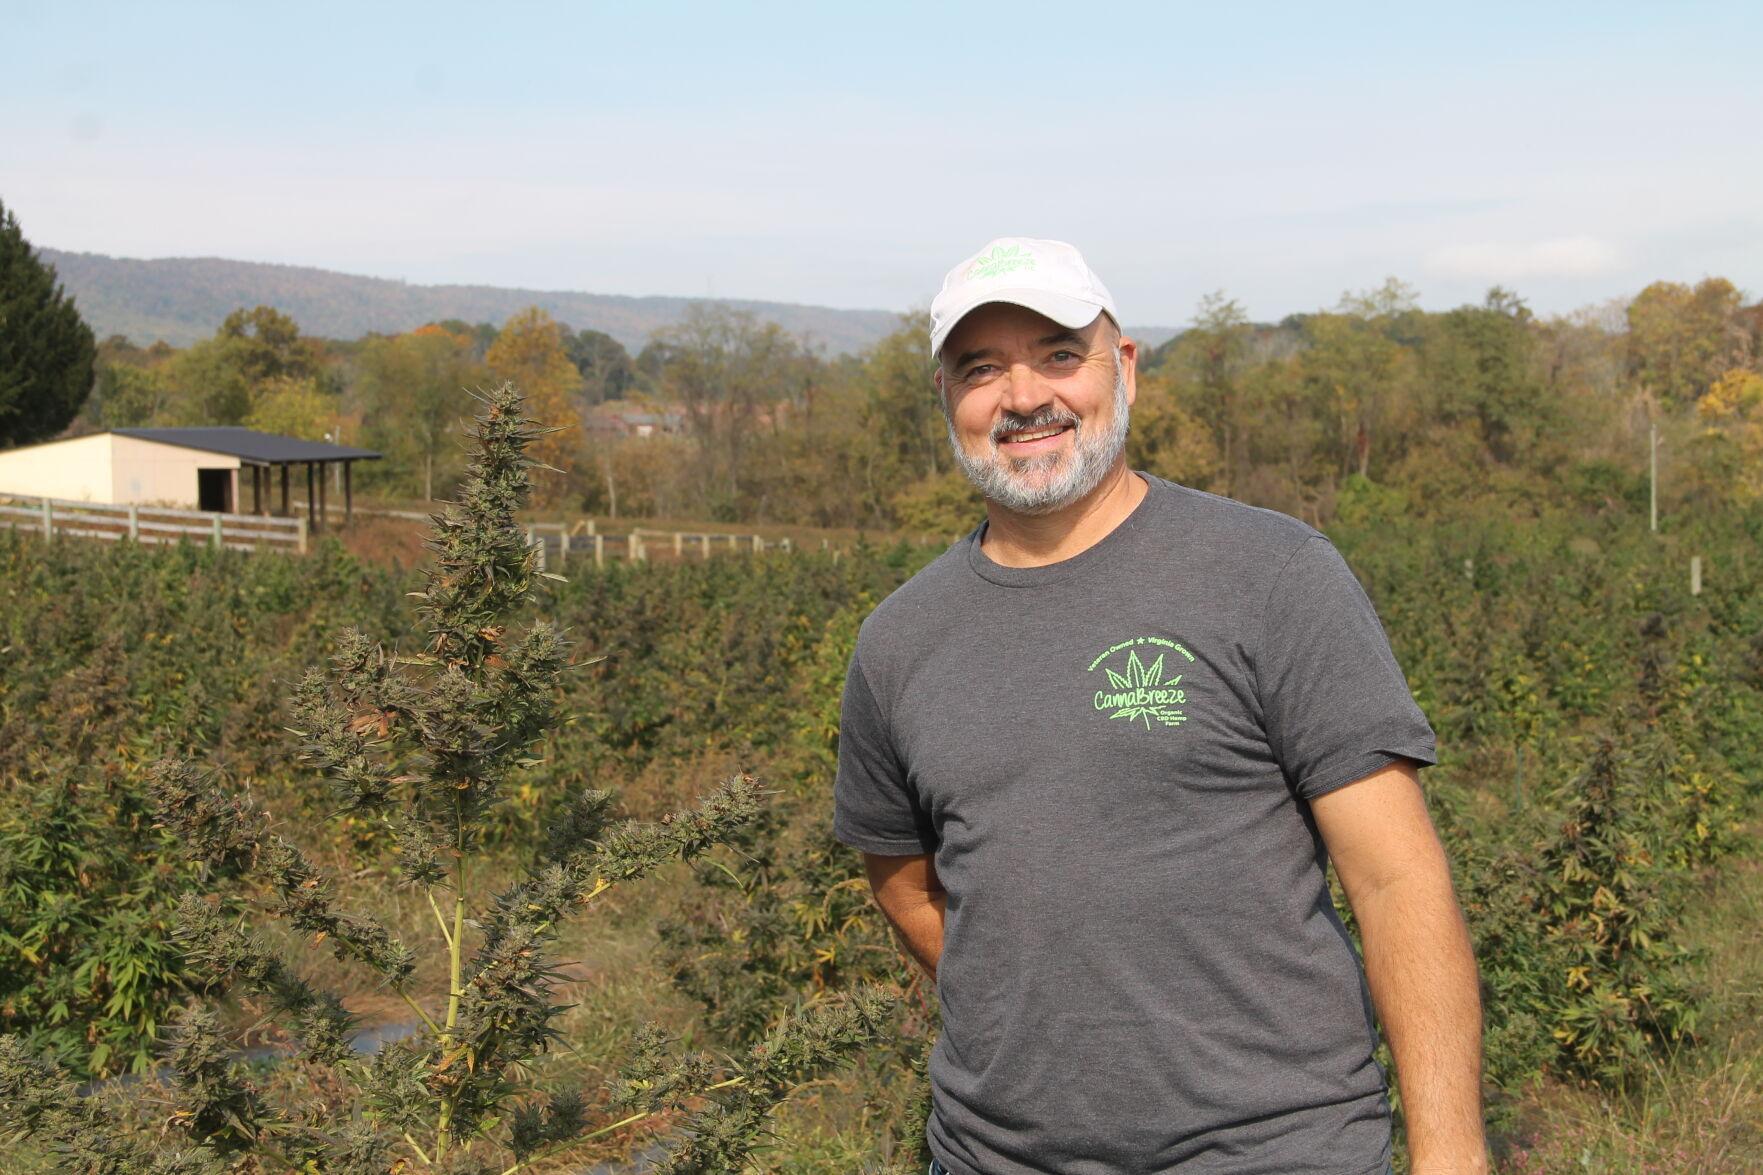 Loudoun S New Cash Crop Local Farmers See Opportunity In Growing Hemp Market News Loudountimes Com